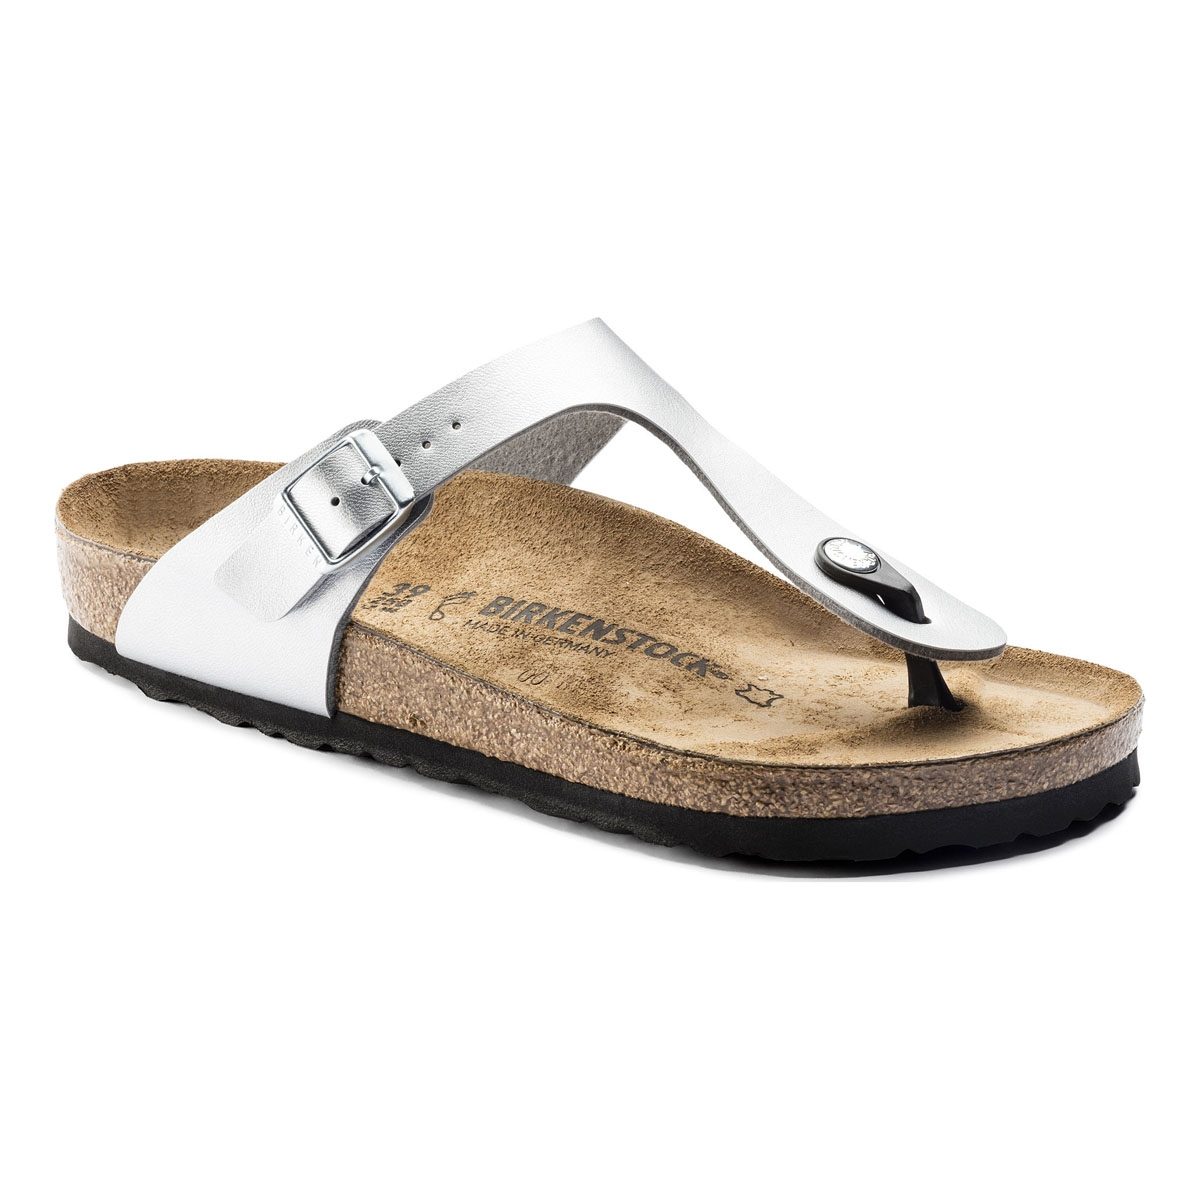 c7335b2a6abb Image of Birkenstock Gizeh Birko-Flor Synthetic Leather Sandals (Women s) -  Silver